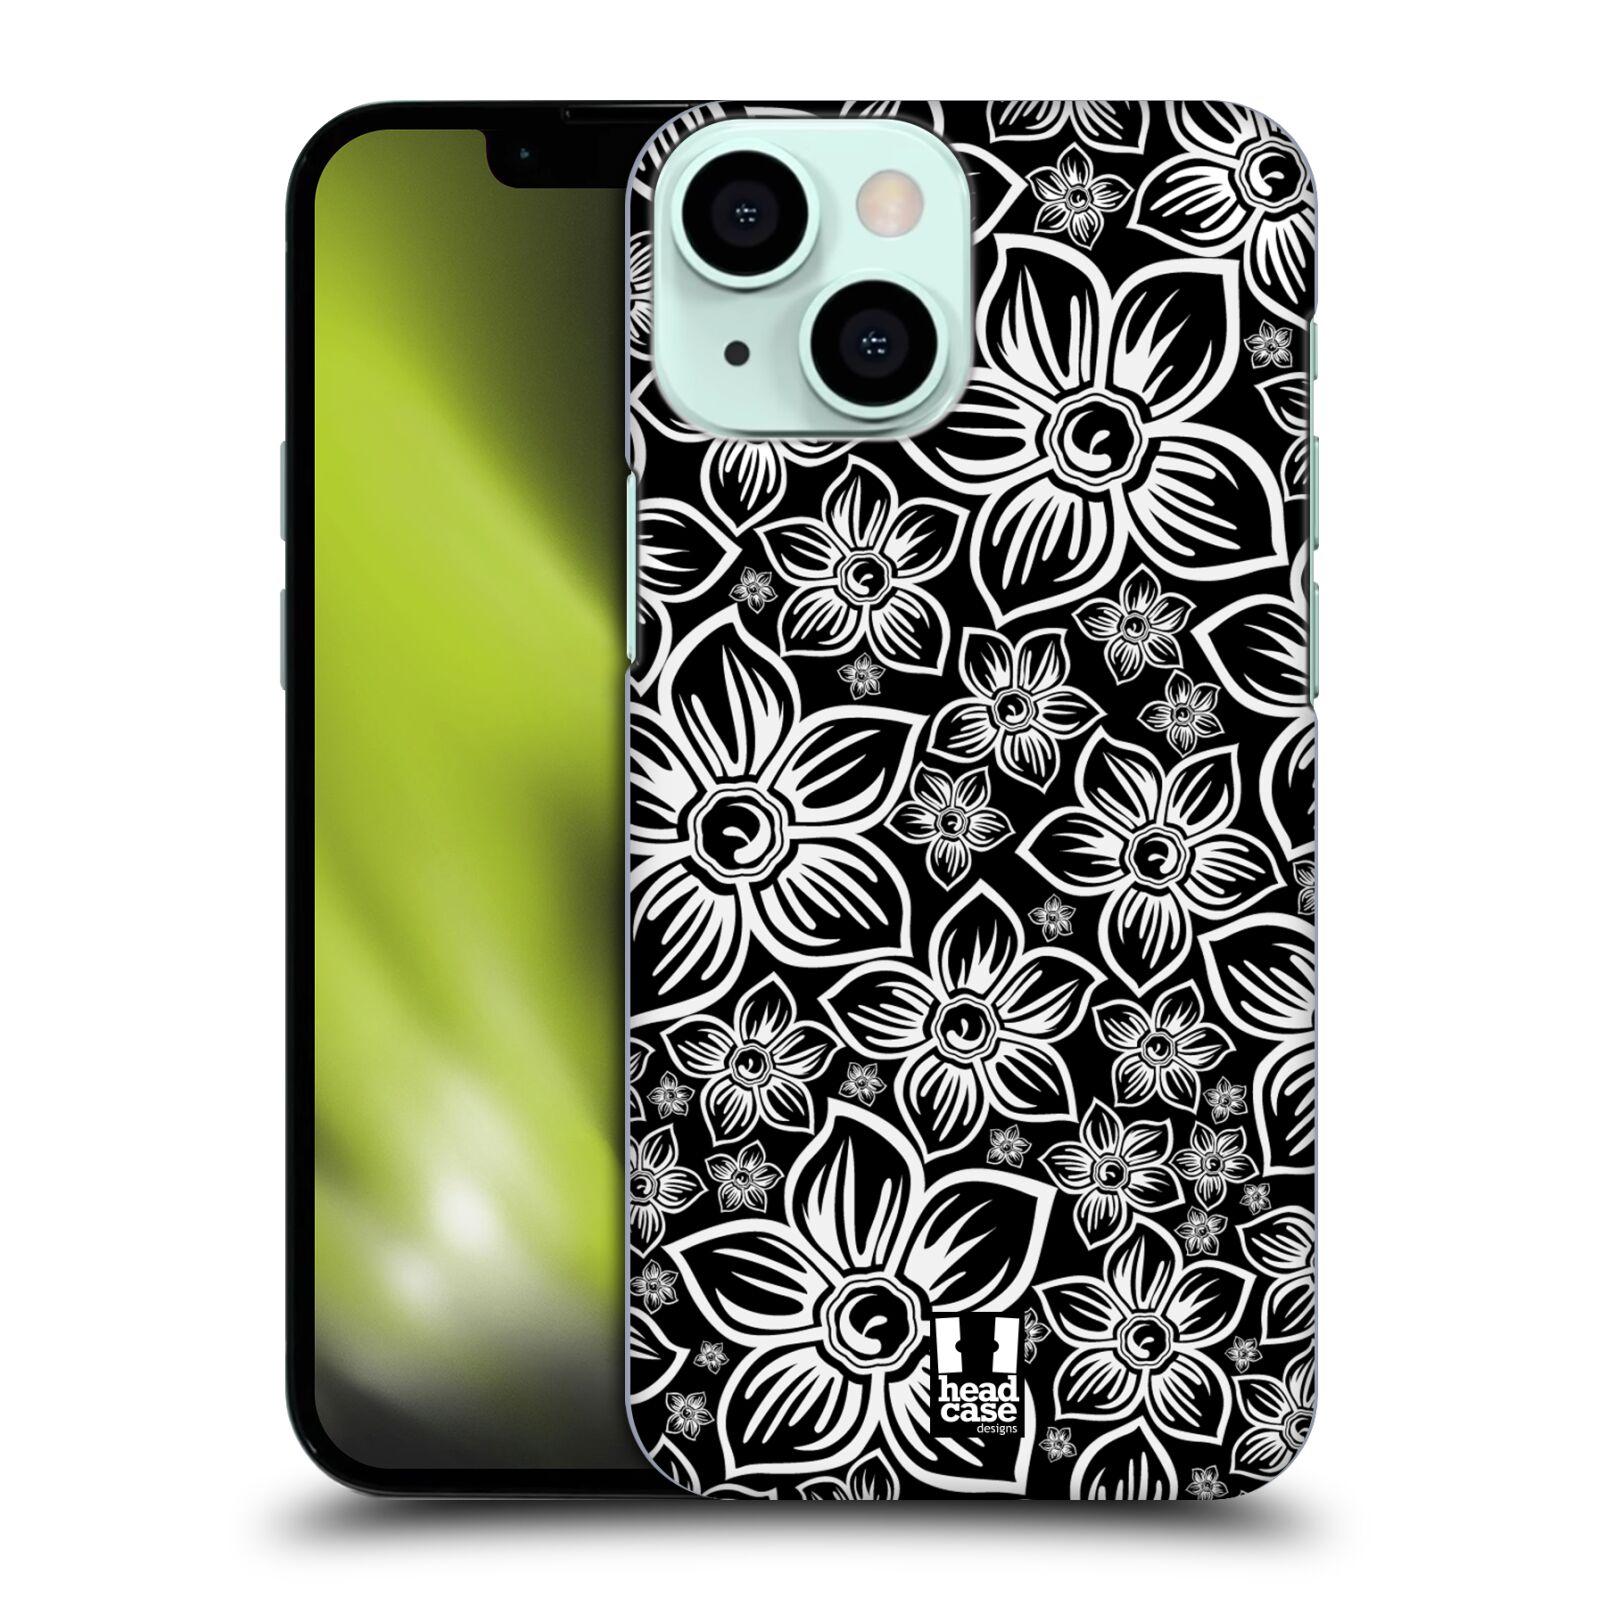 Plastové pouzdro na mobil Apple iPhone 13 Mini - Head Case - FLORAL DAISY